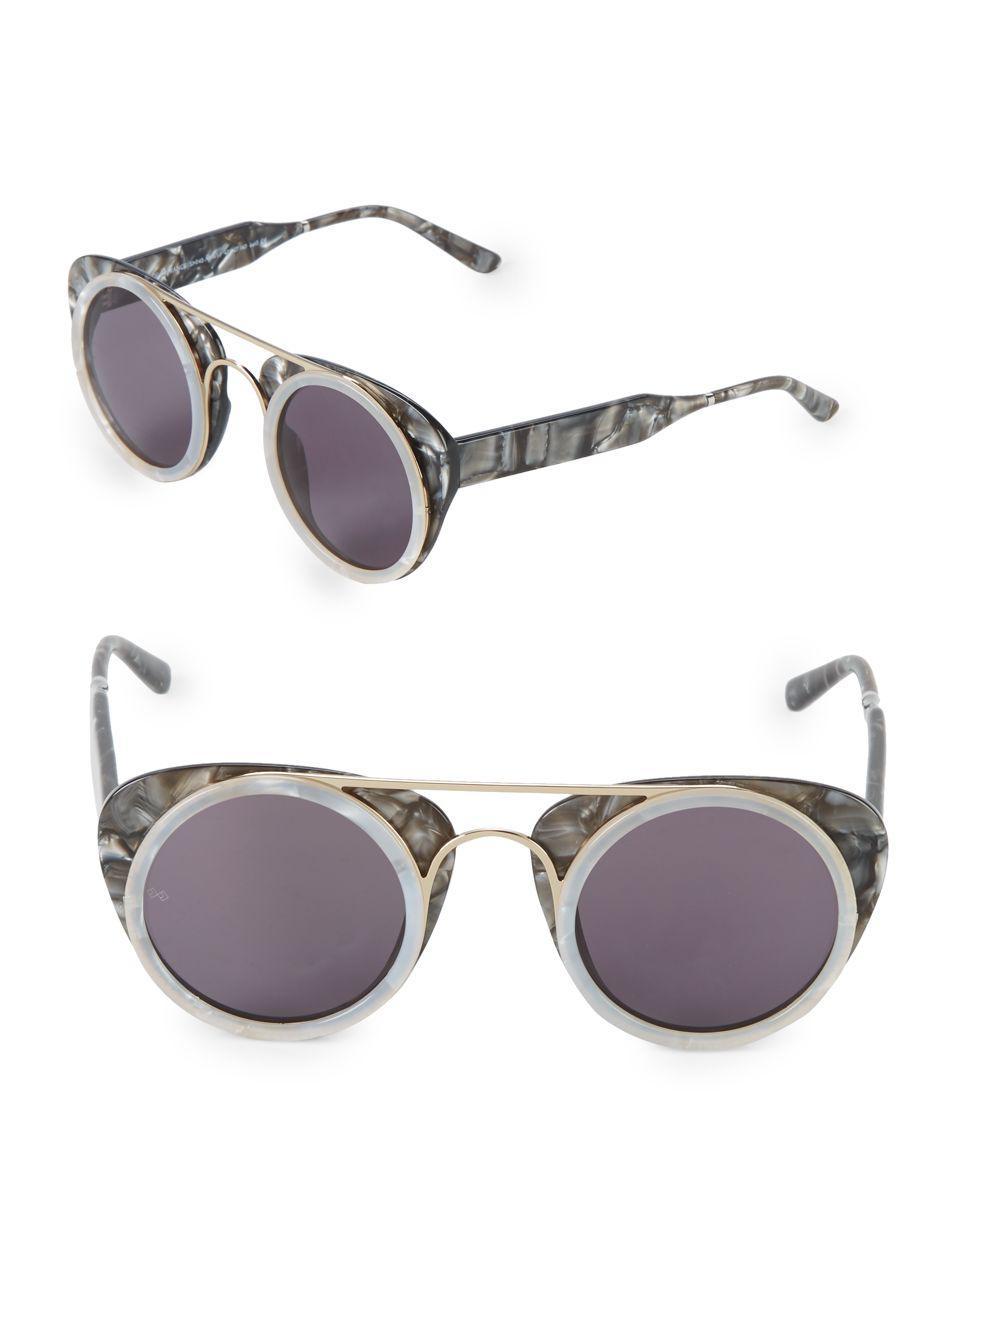 f7f7b4bf09 Smoke X Mirrors Sodapop Iii 47mm Round Sunglasses in Gray - Lyst